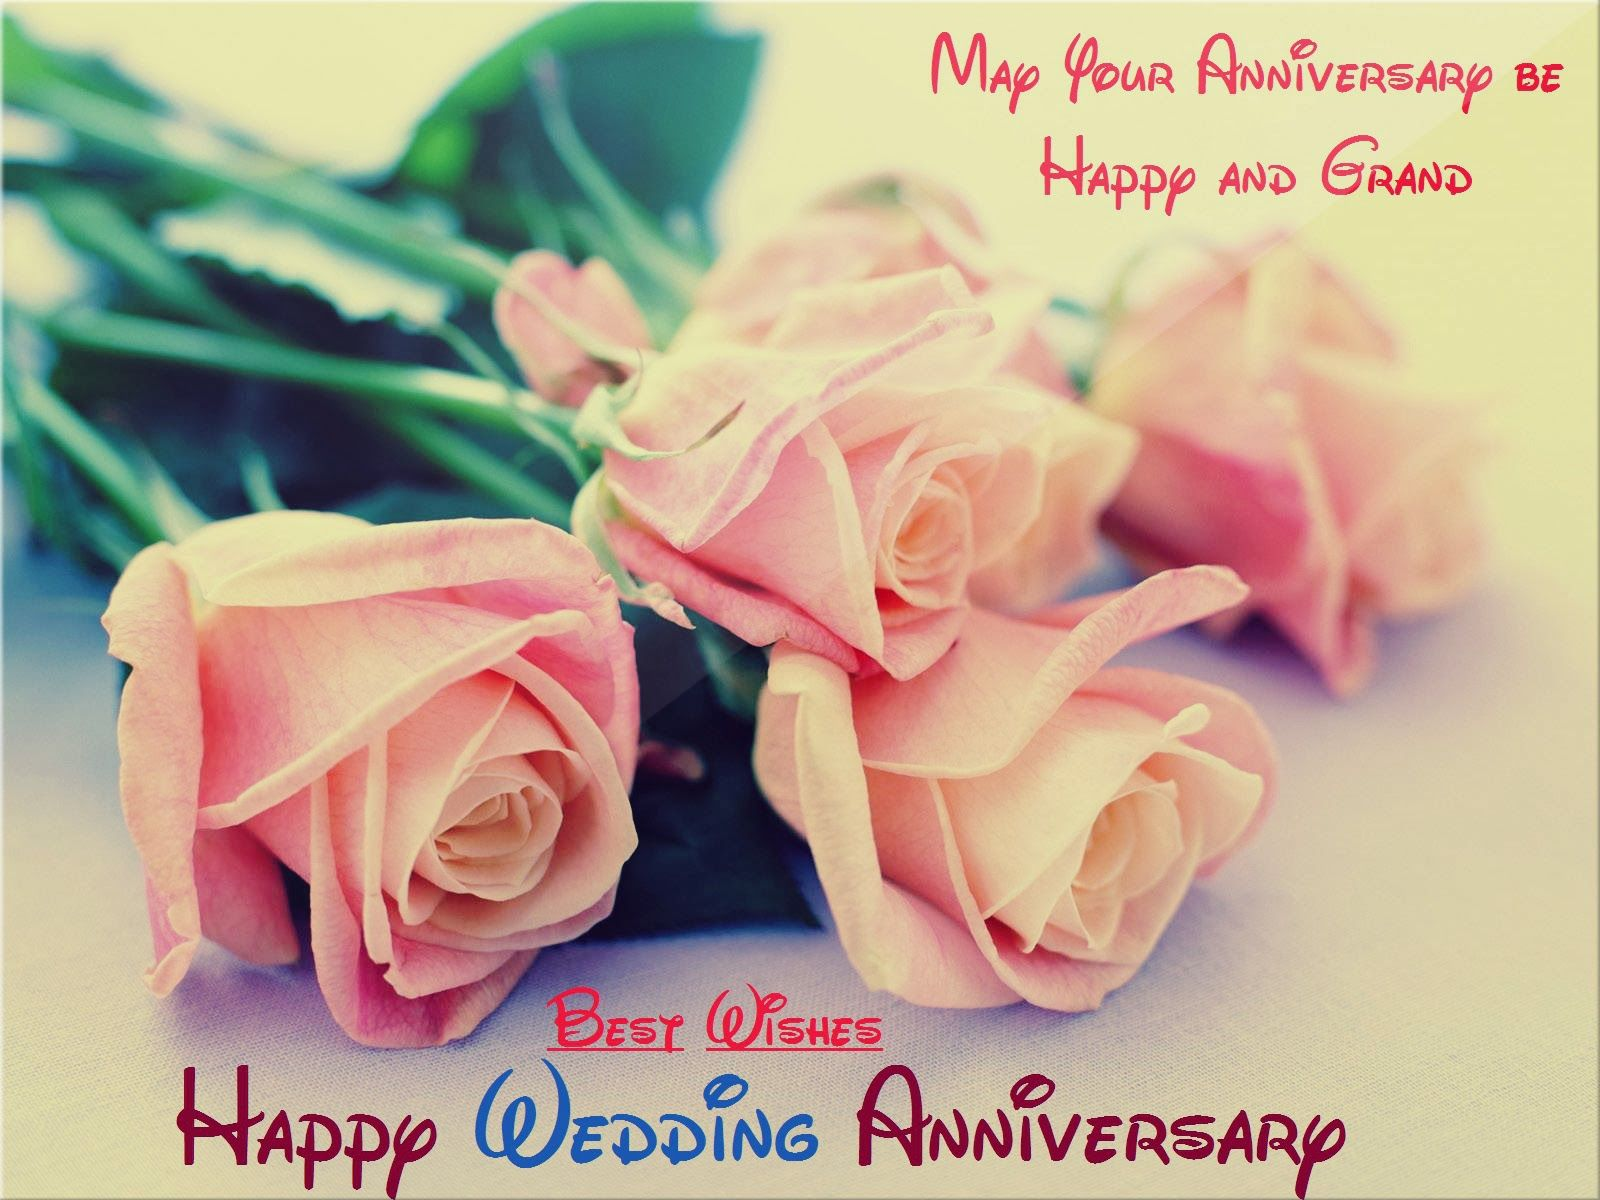 happy anniversary wishes in hindi Marriage Anniversary